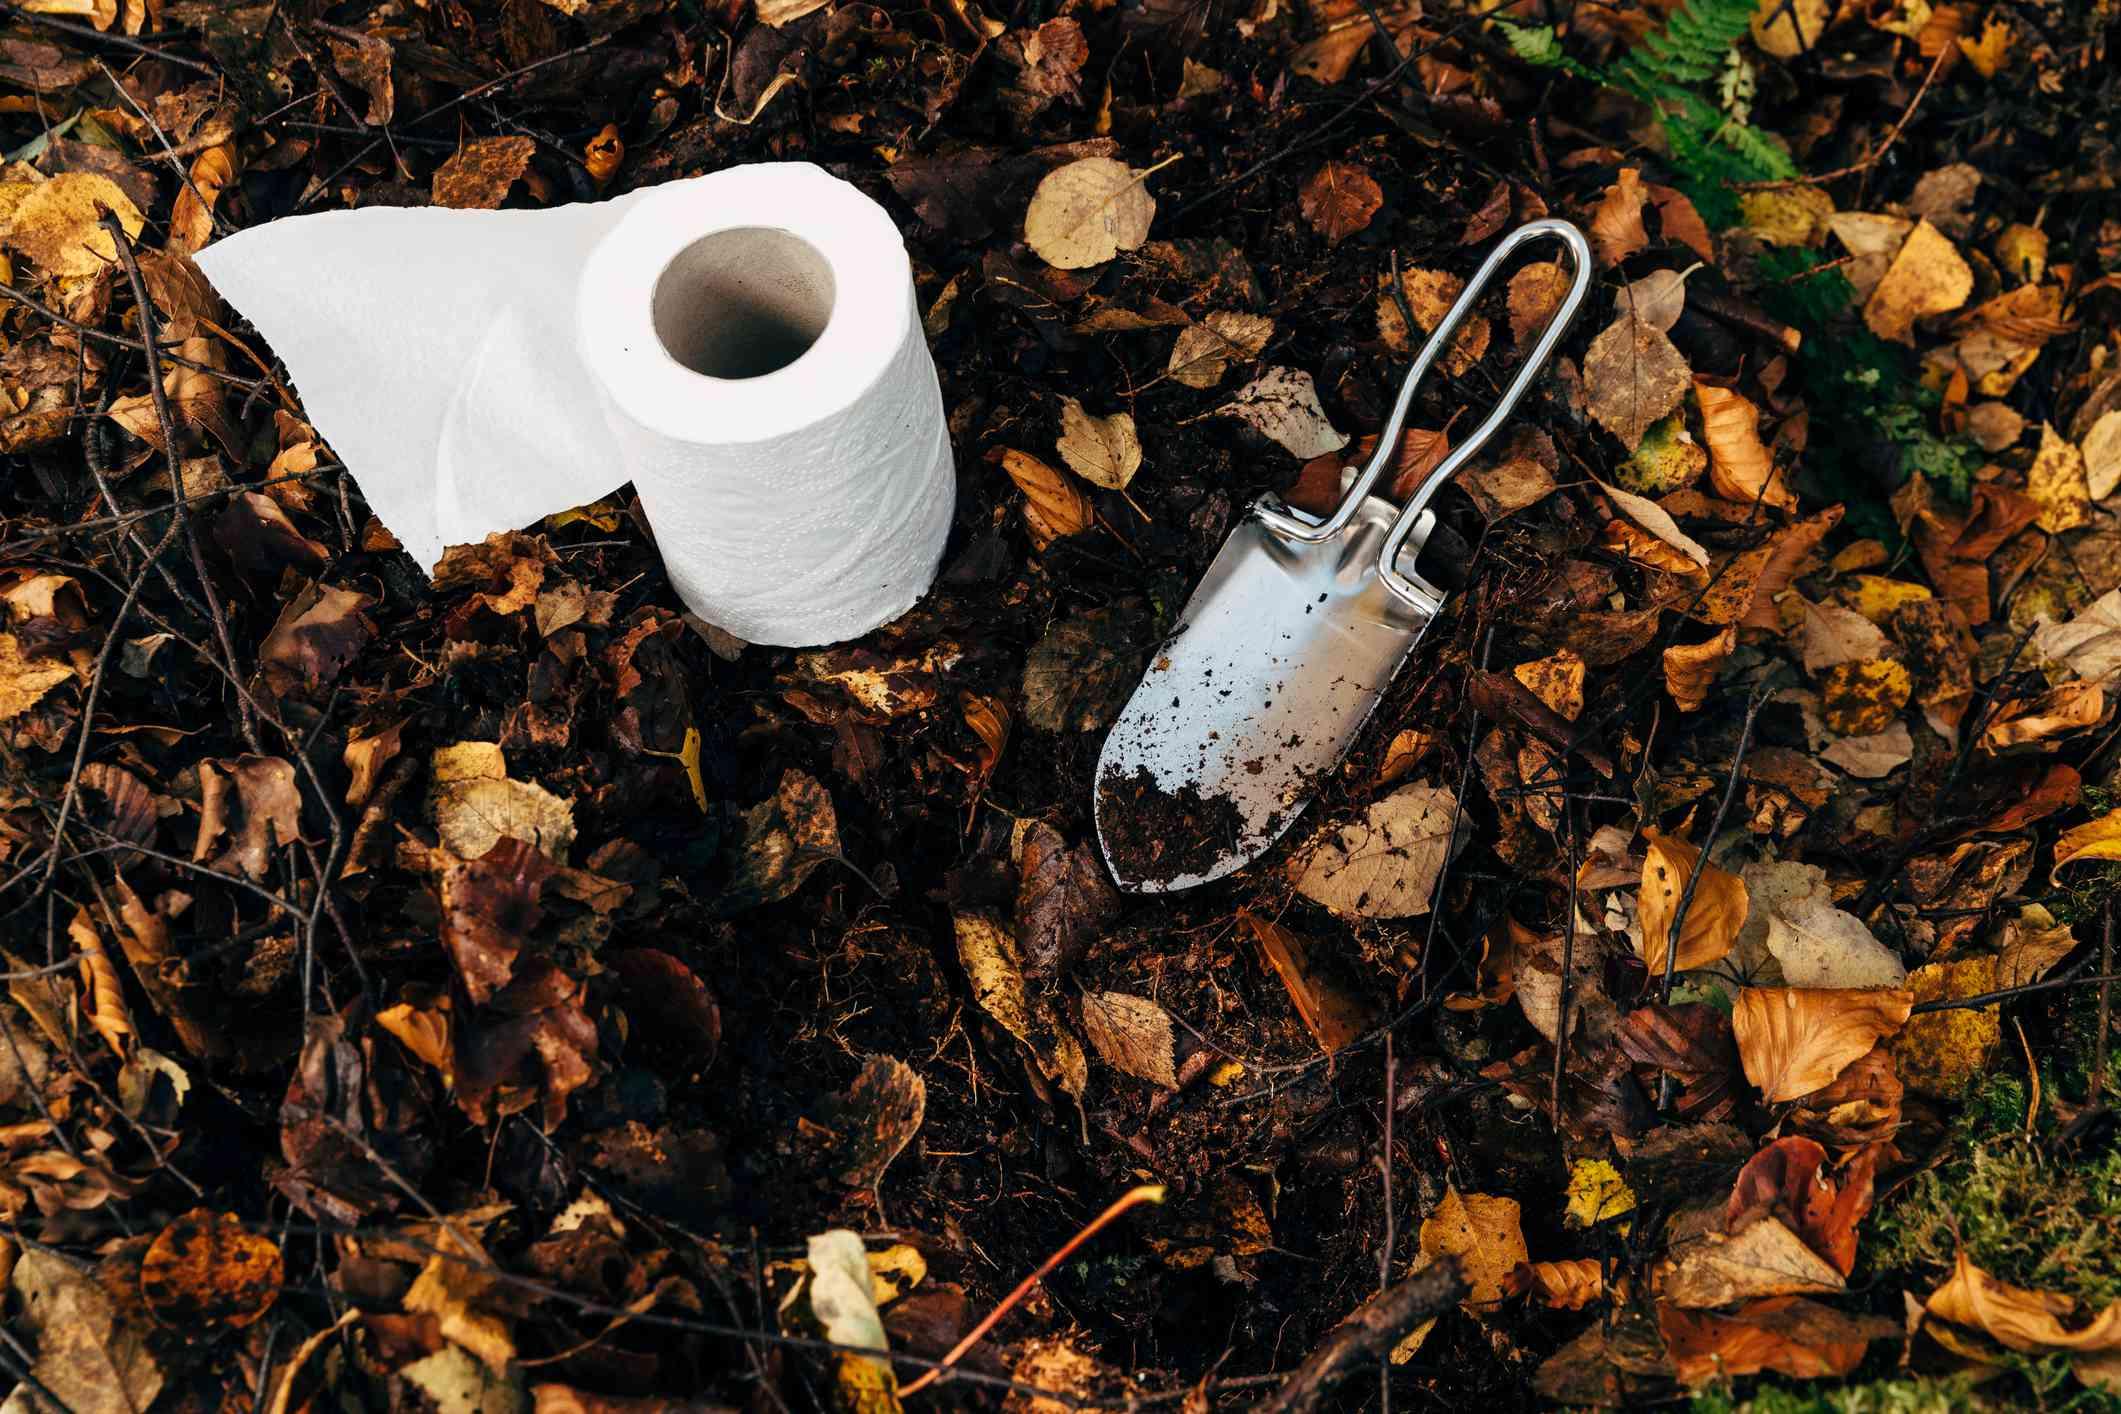 Preparing outdoor bathroom break with shovel and toilet paper